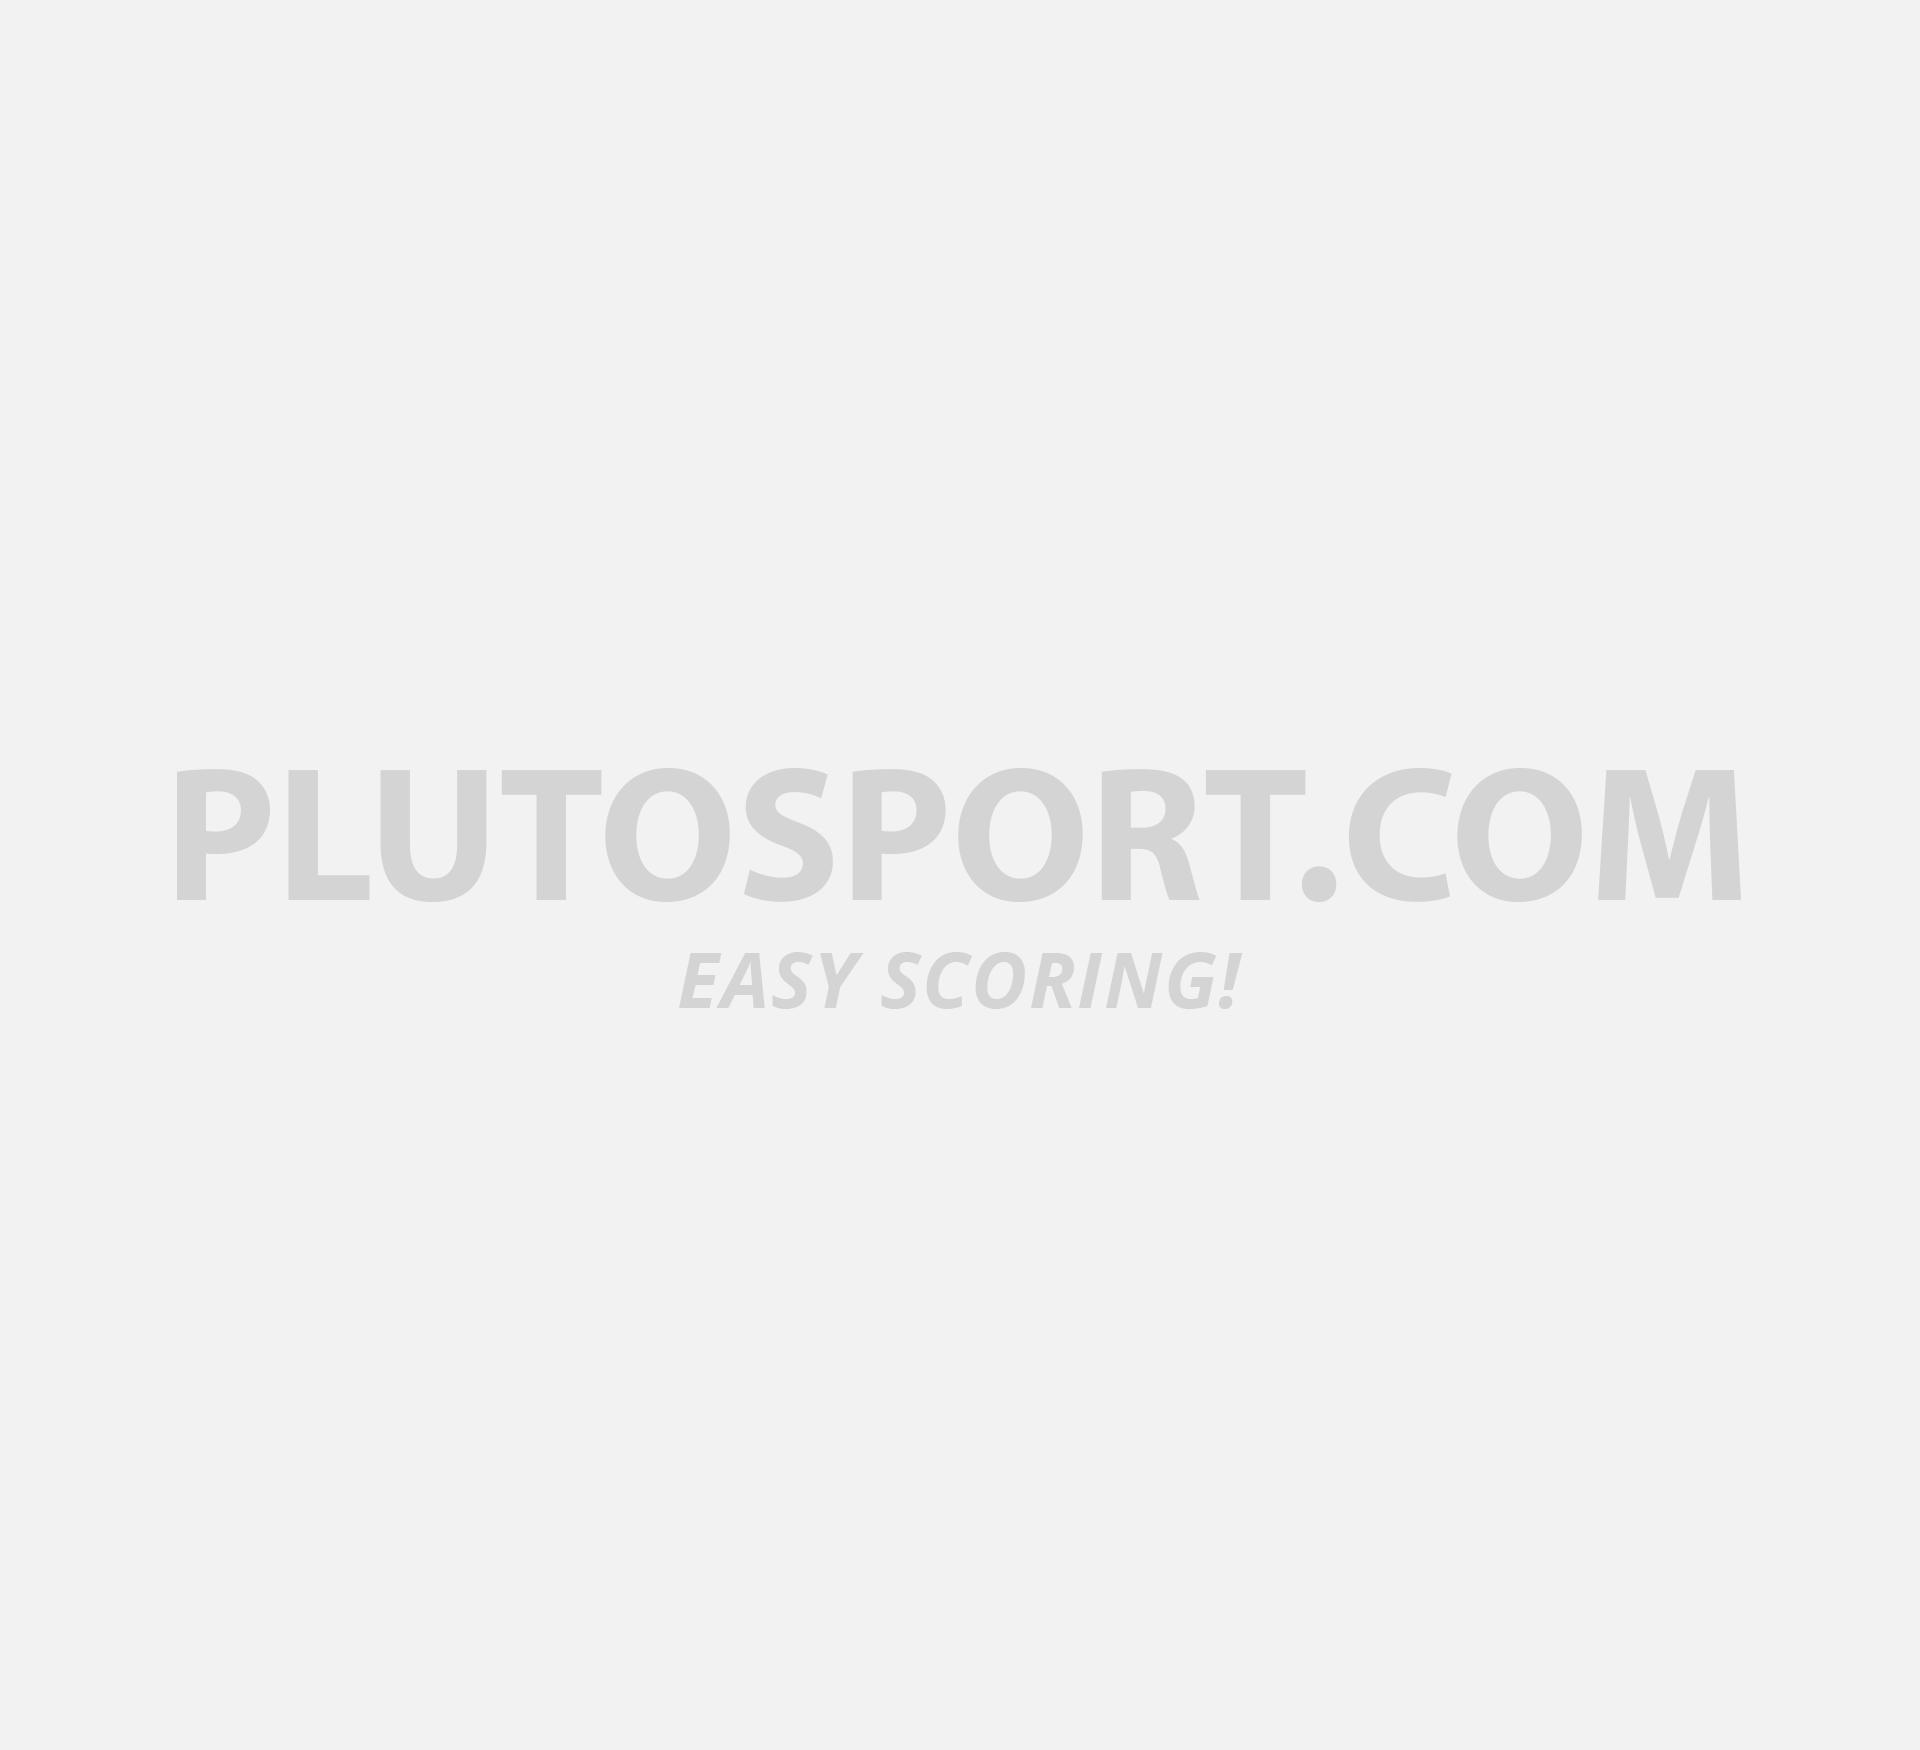 cc854e7d911daa Adidas Dragon CF I Sneakers Kids - Sneakers - Shoes - Lifestyle - Sports